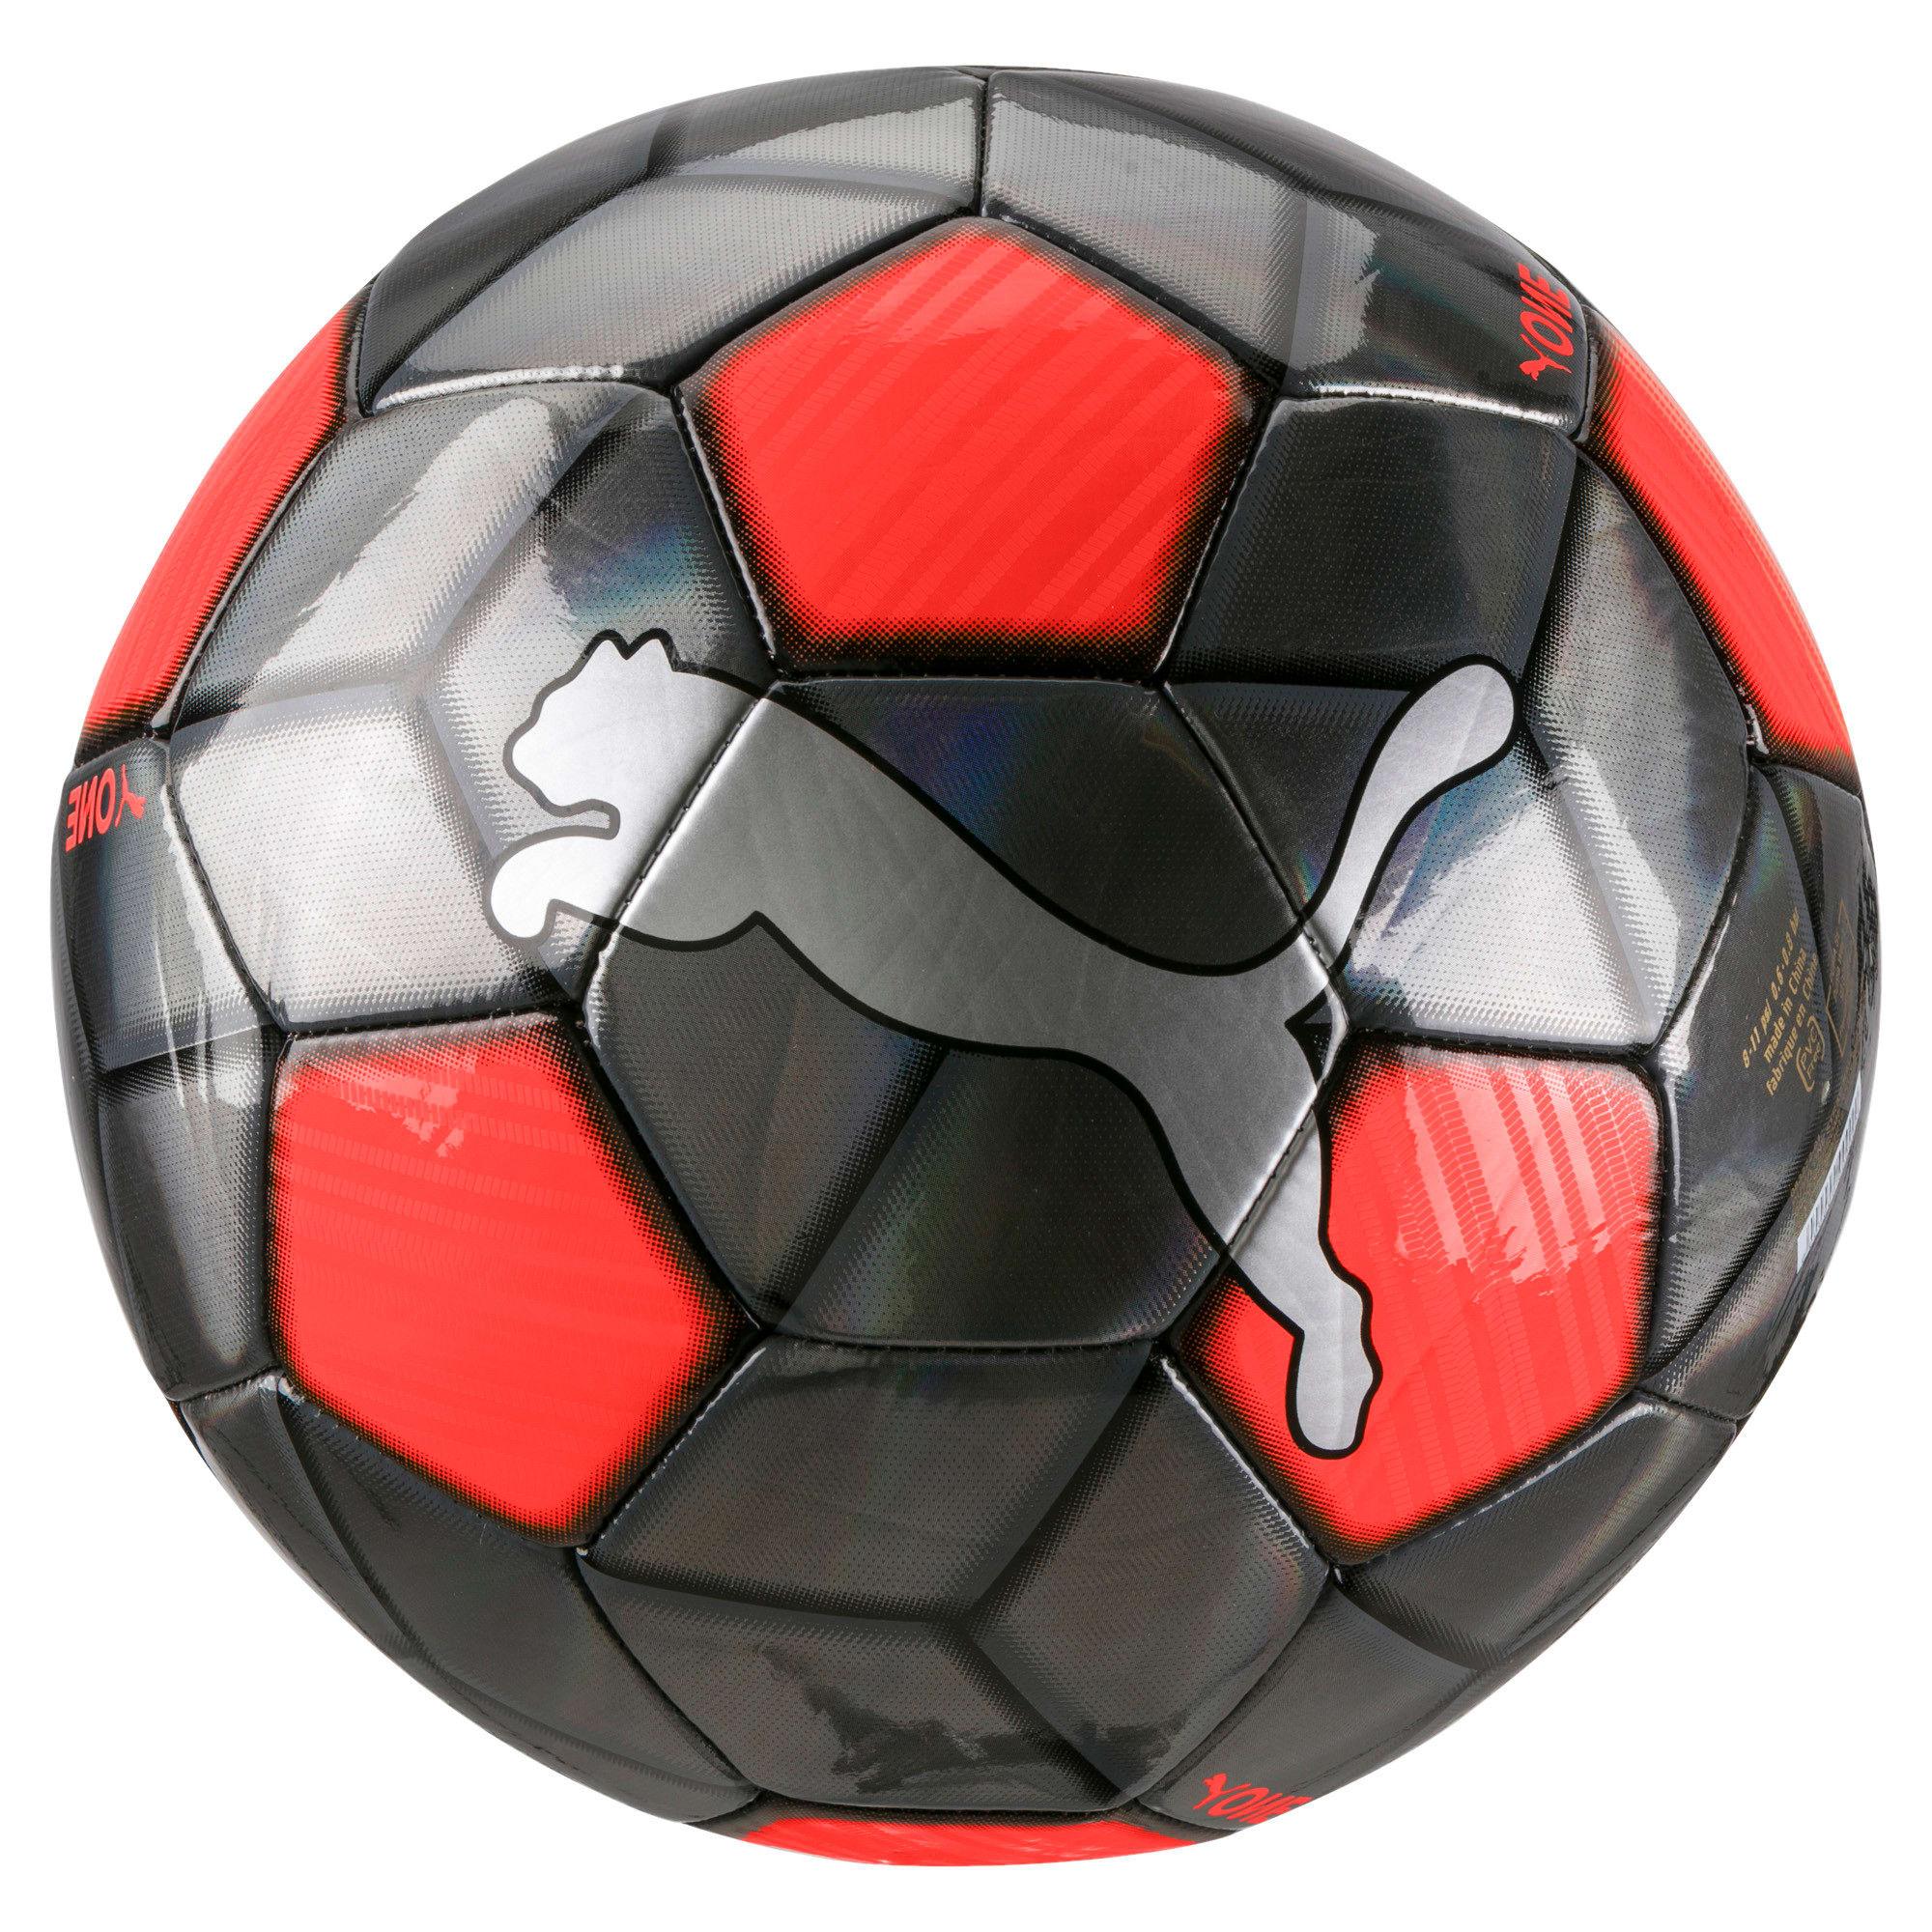 Thumbnail 1 of PUMA One Strap Soccer Ball, Silver-Nrgy Red-Puma Black, medium